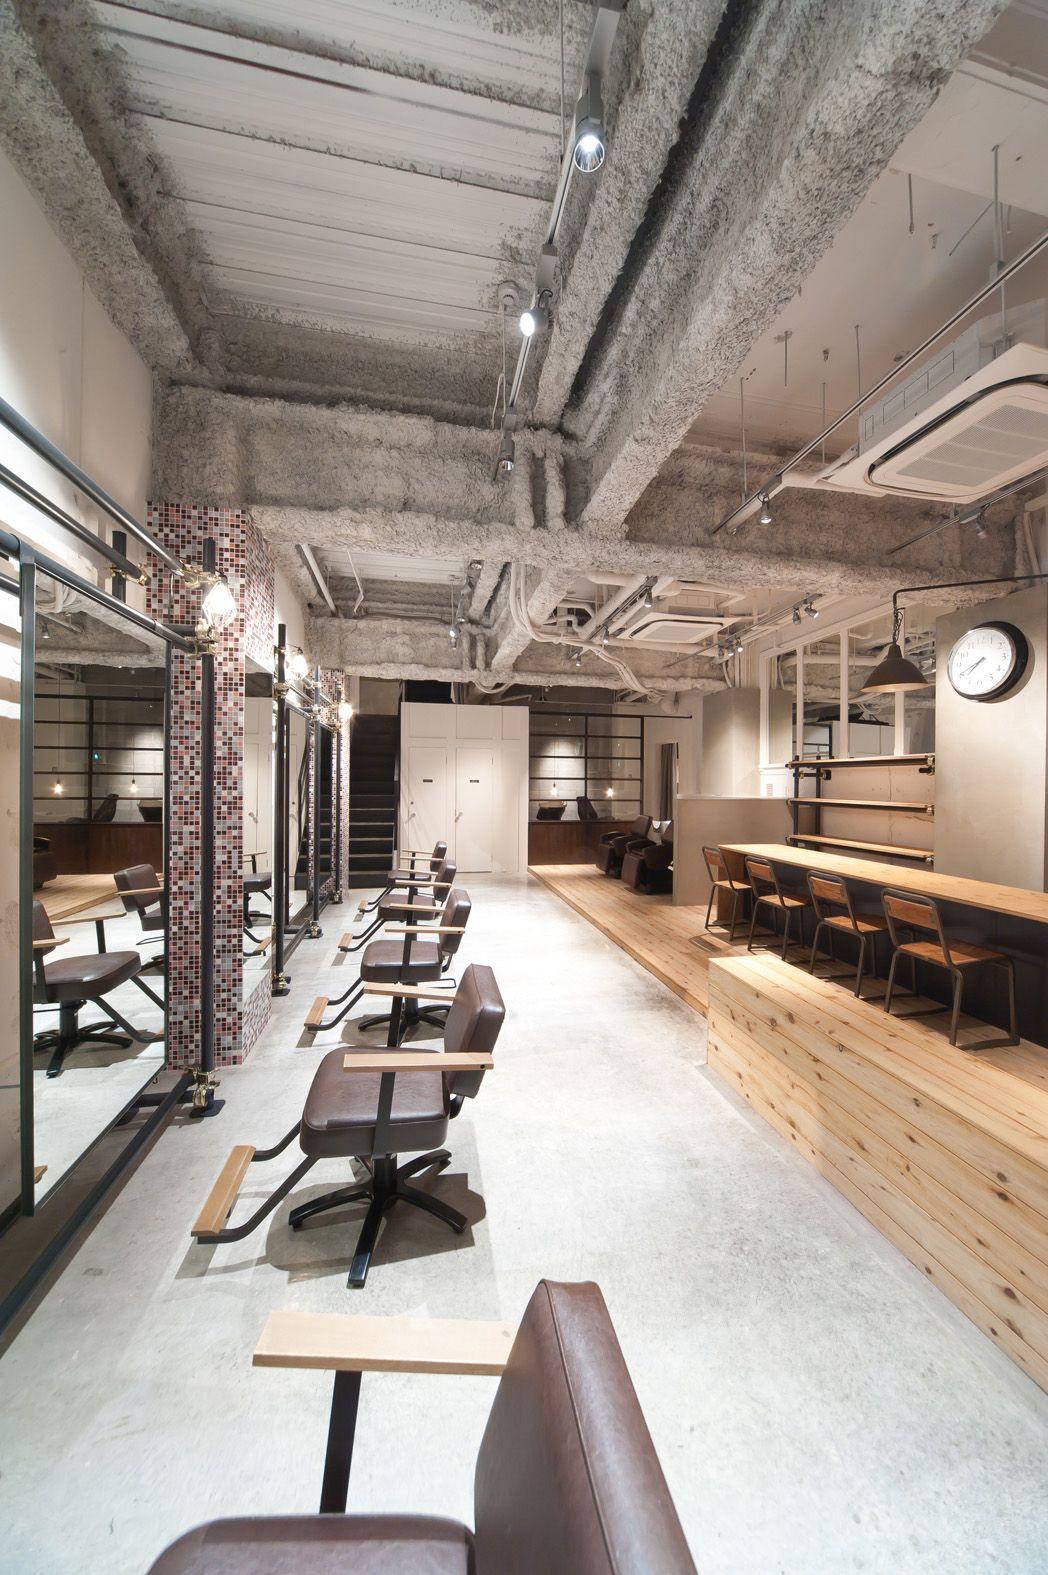 Idea Appeal 大阪府大阪市の美容室 Fier の店舗デザイン 2020